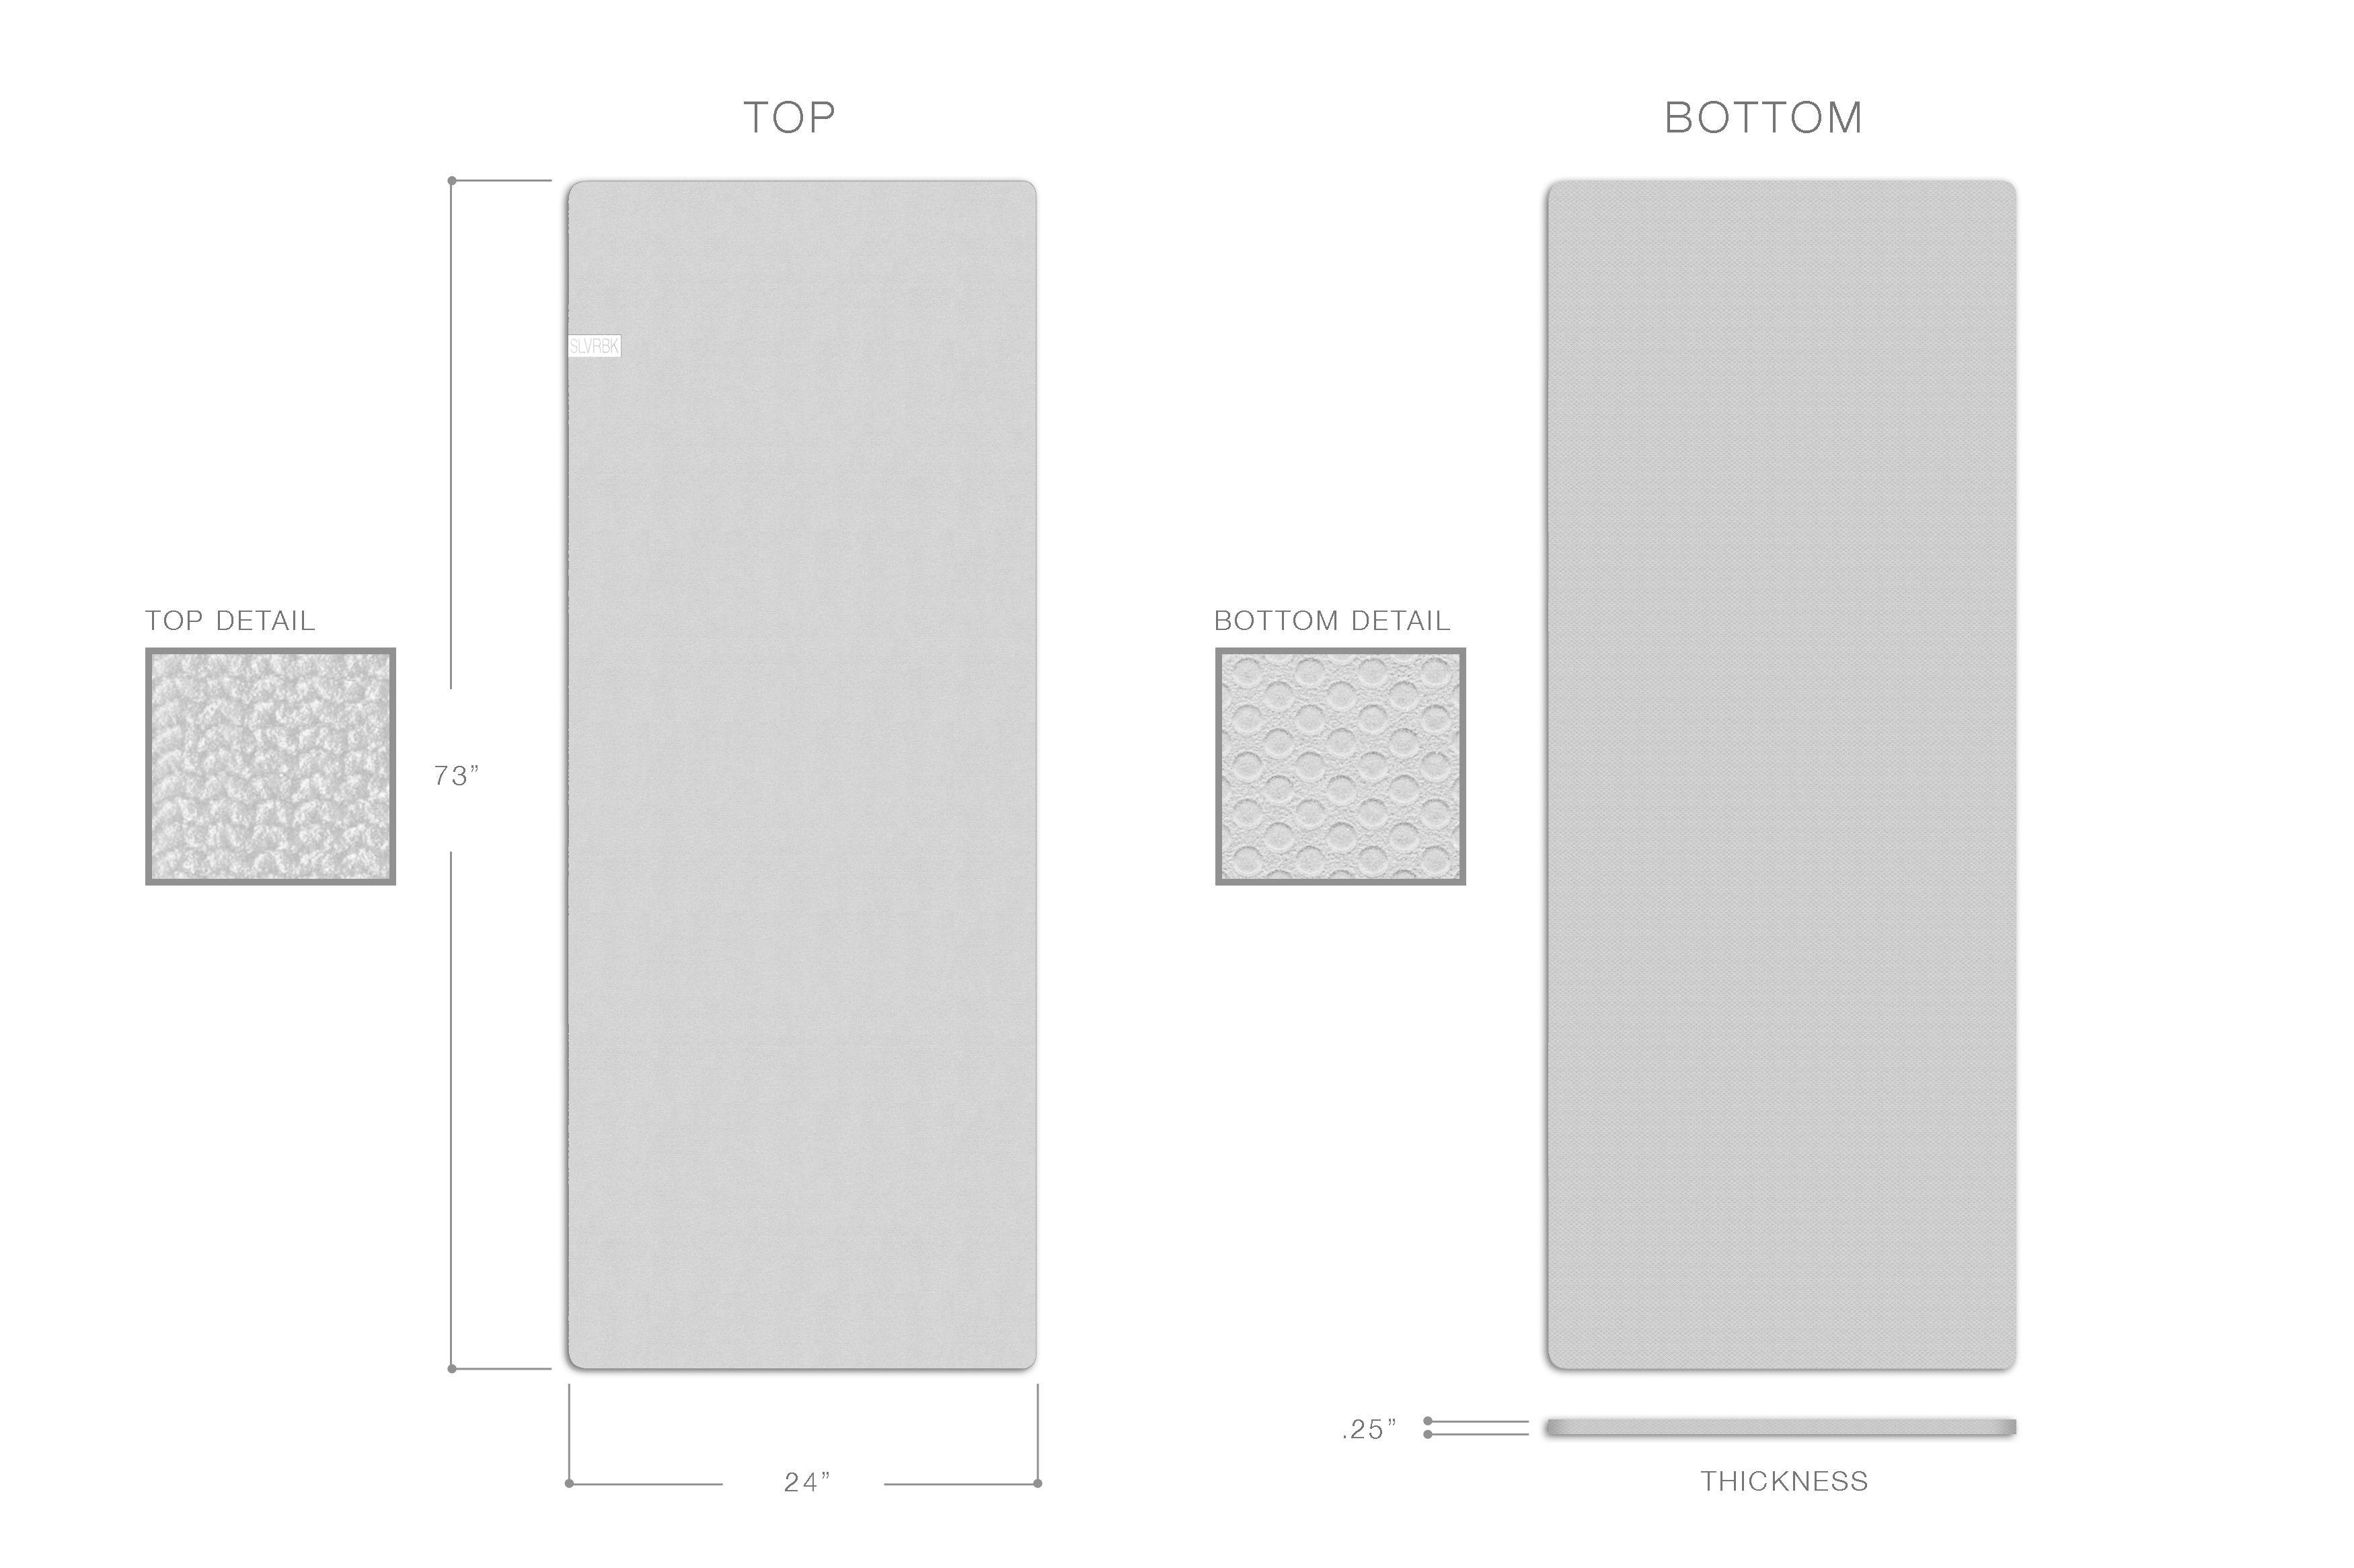 yoga mat dimensions - Google Search | Mats, Yoga mat ...